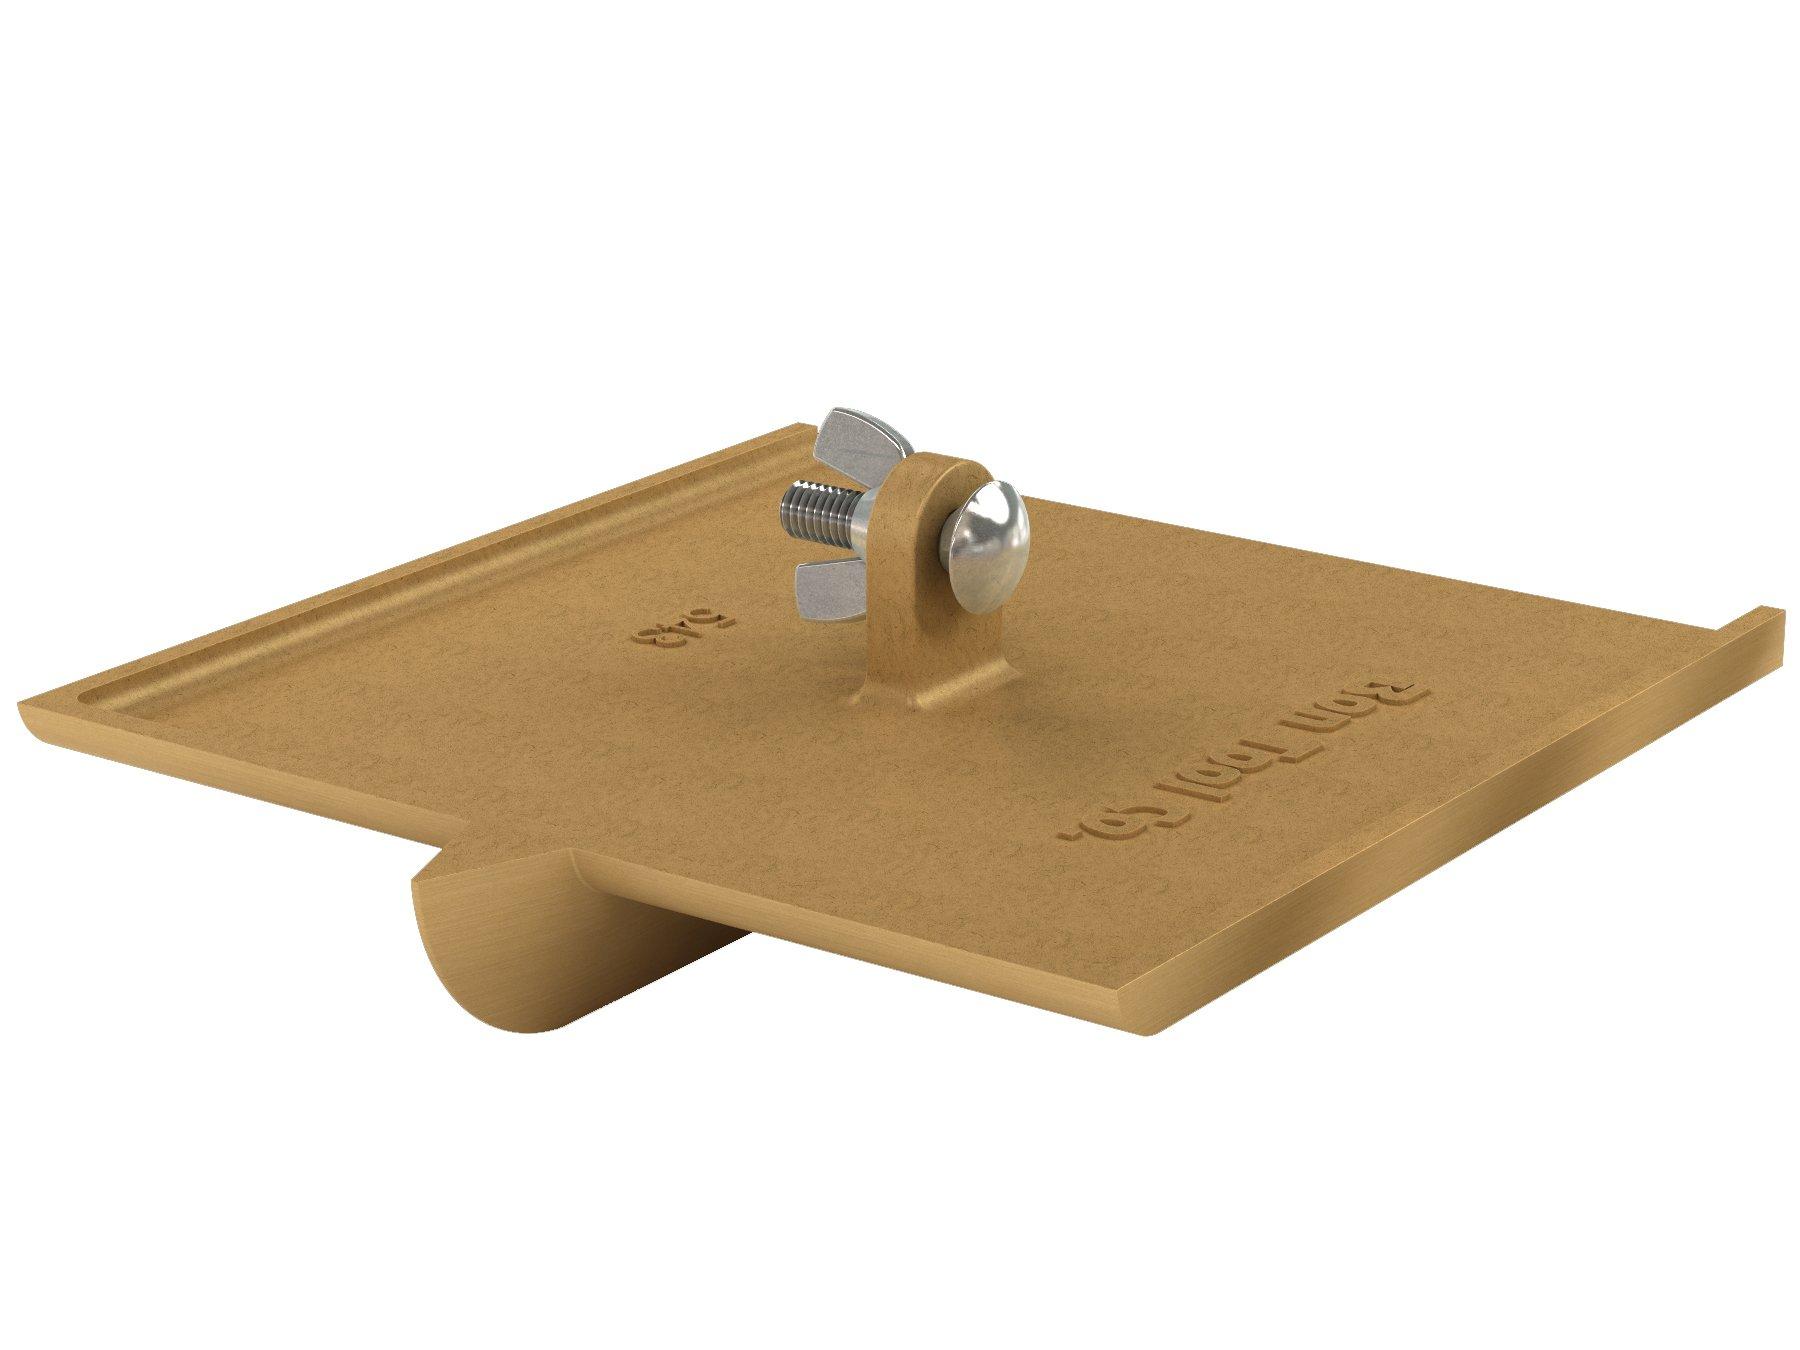 Bon 12-543 1-Inch Bit Depth by 3/8-Inch Width 8-Inch by 8-Inch Walking Concrete Groover, Bronze